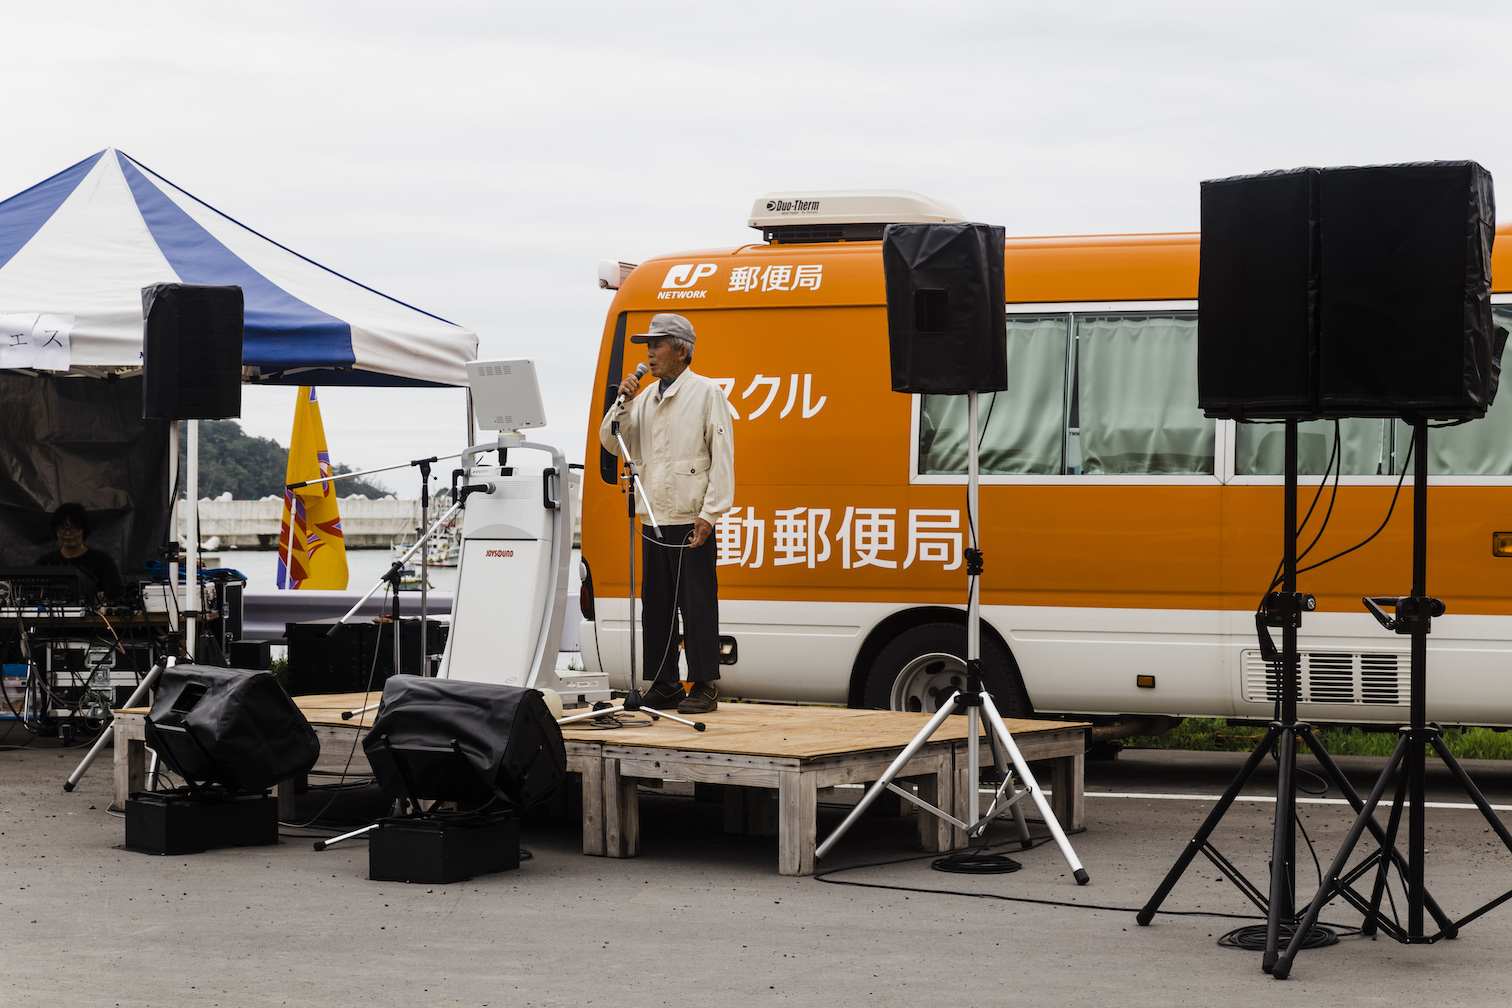 Ghosts of the Tsunami, Japan (2016) Photographer Photojournalist Journalist Filmmaker Japan Tsunami Earthquake Fukushima Tohoku Sendai Miyagi